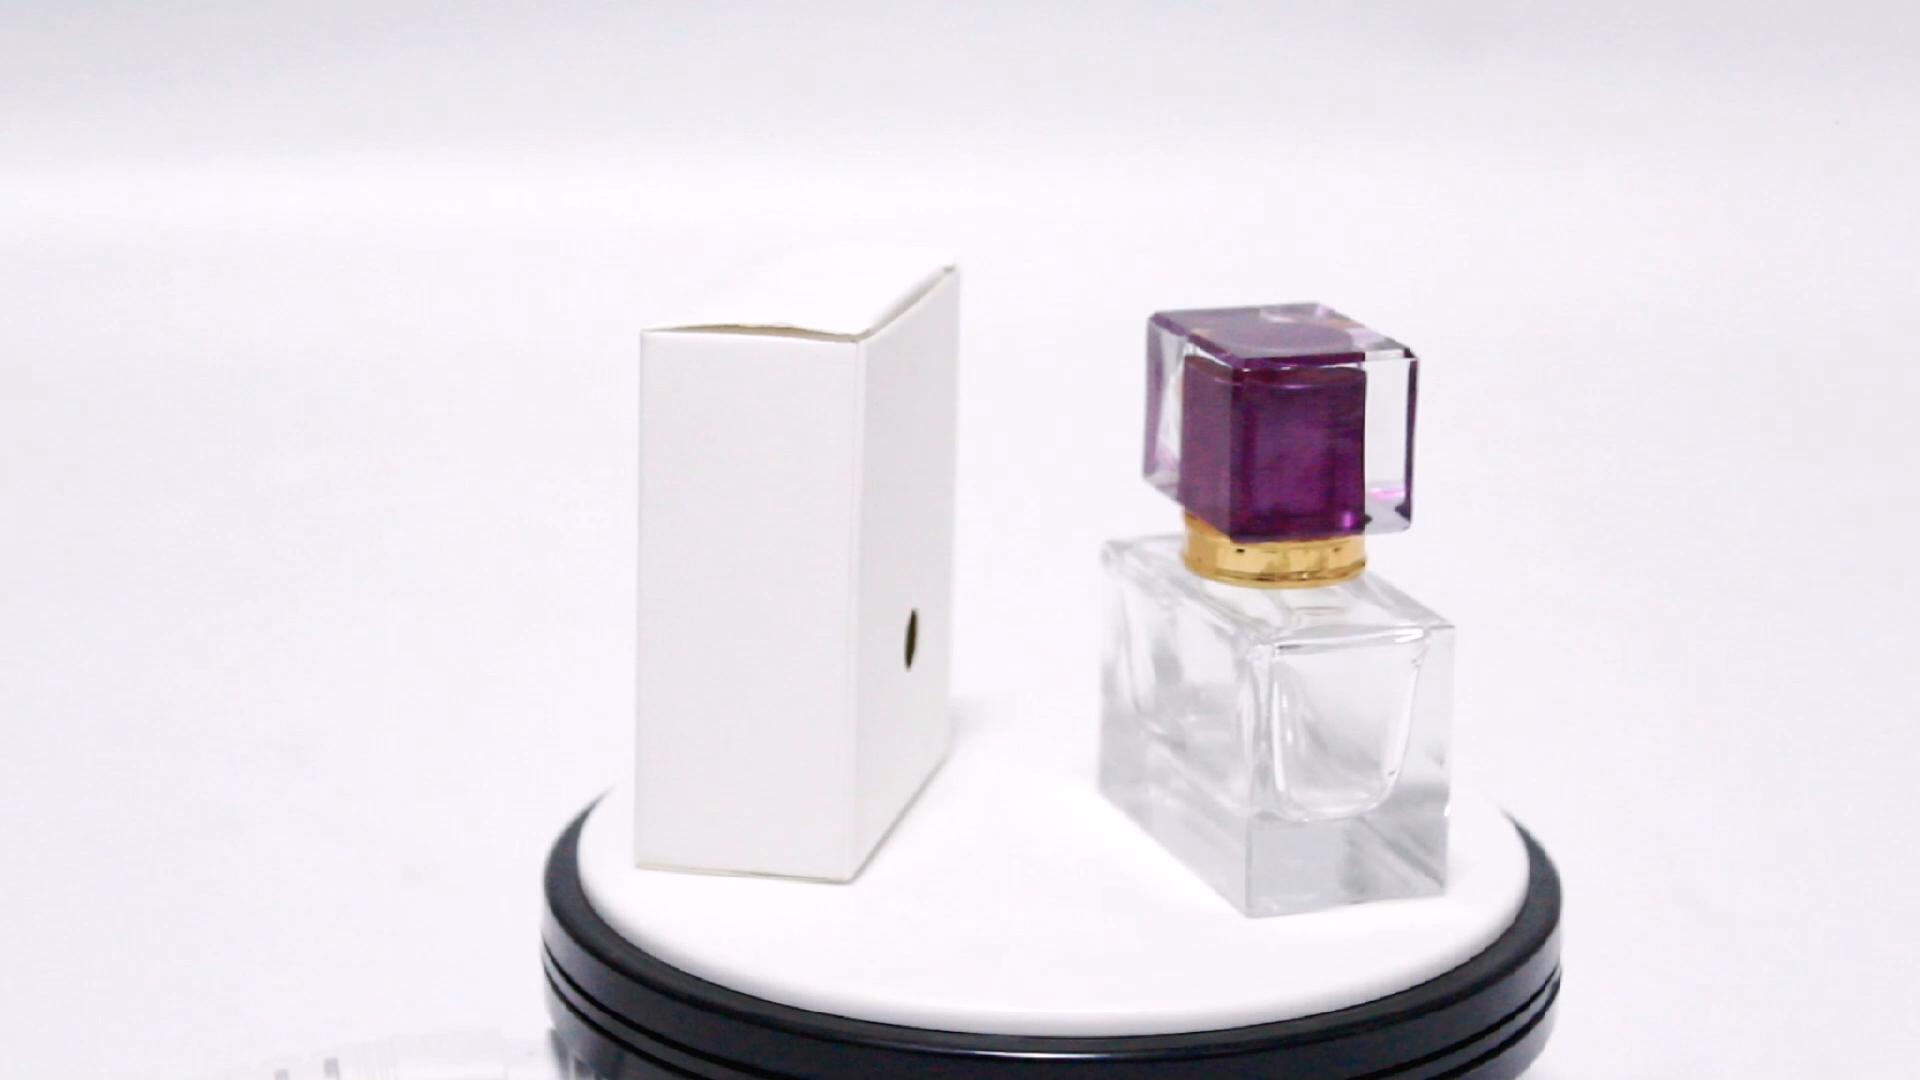 High Quality  30ml Perfume Bottle Pump Lady Portable Atomizer Bottle Travel Refillable Perfume Spray